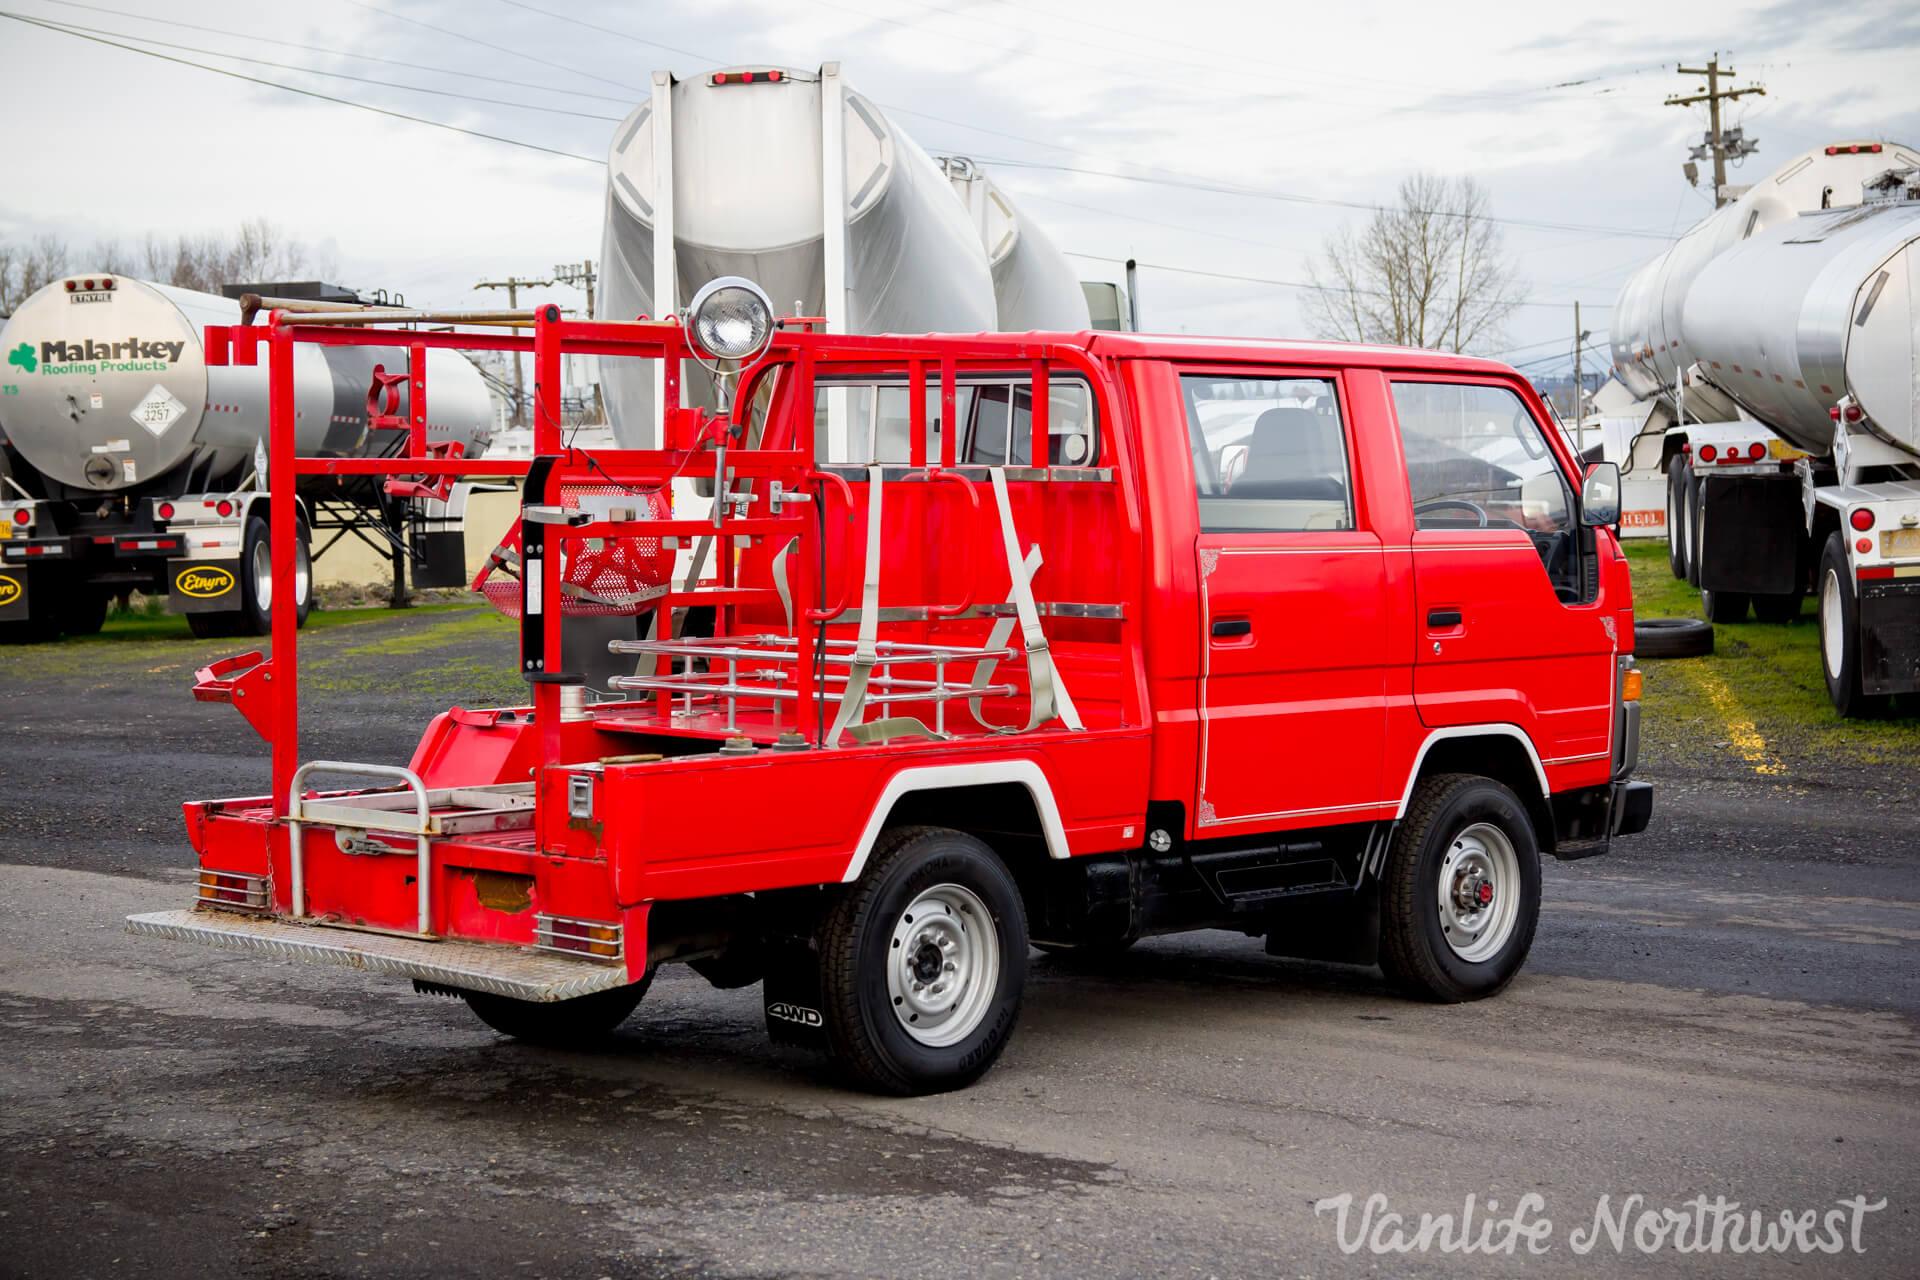 ToyotaHiaceFireTruckLH851990-16.jpg